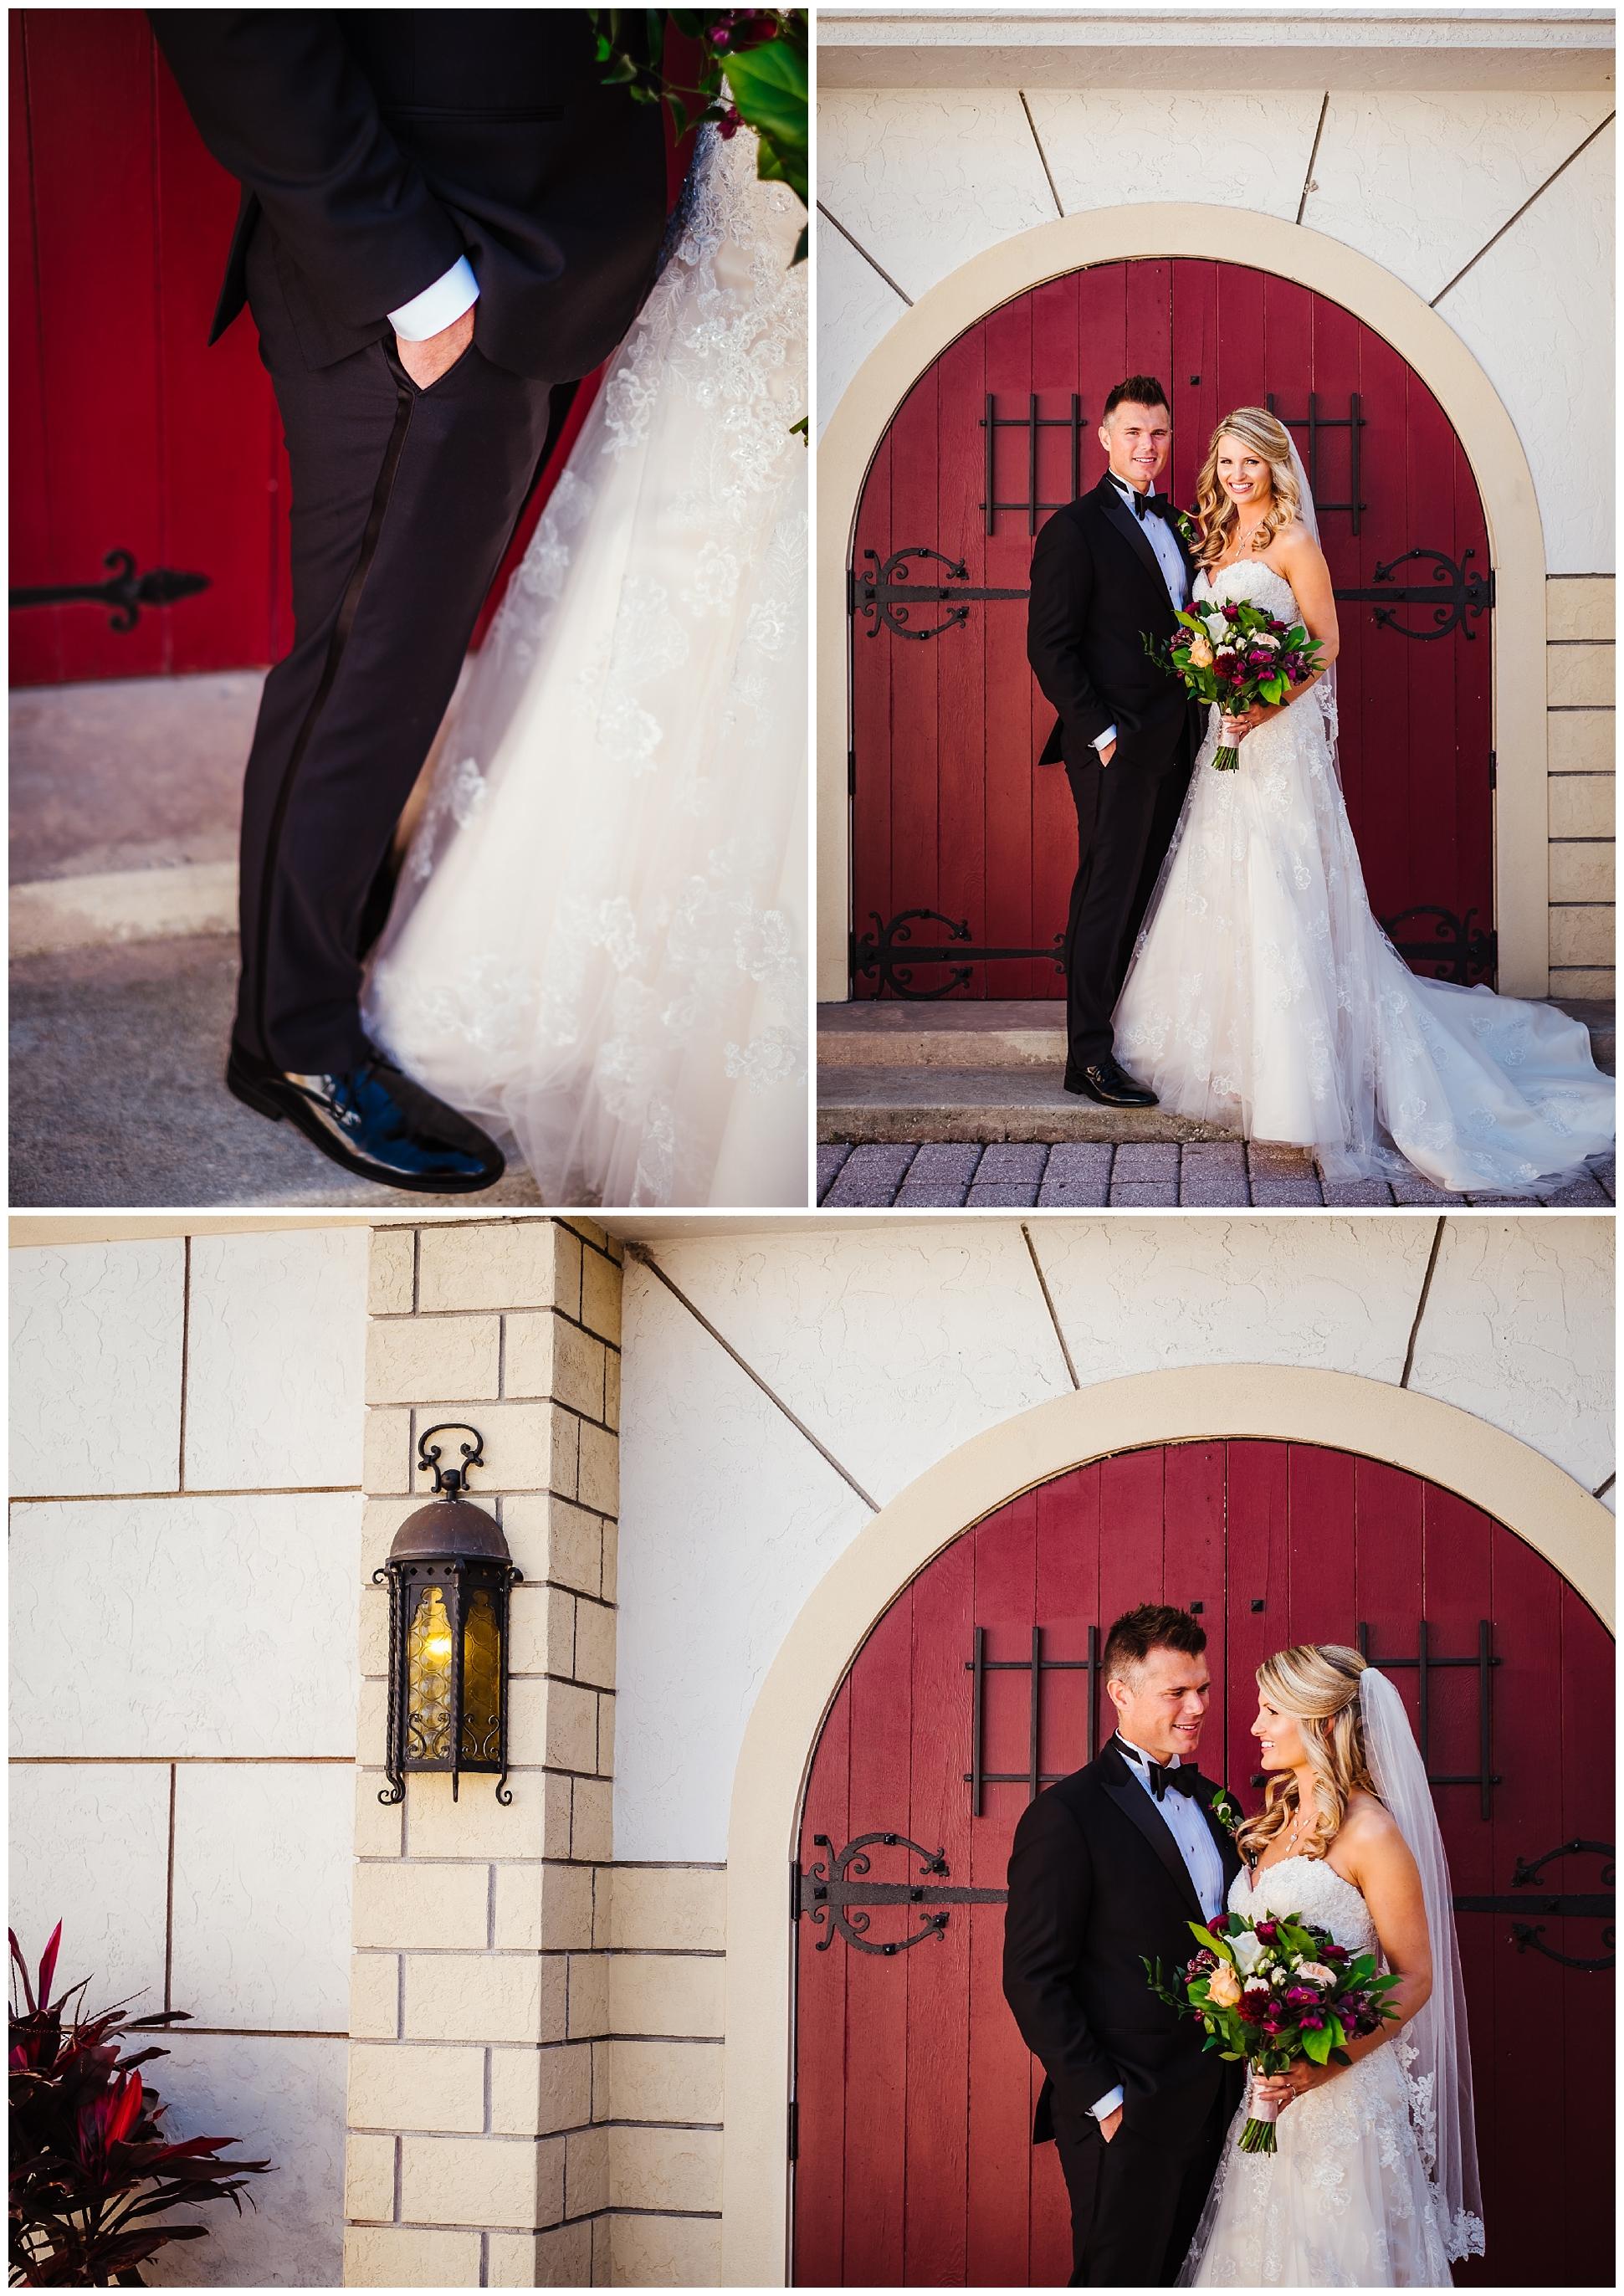 tampa-bradenton-wedding-photographer-south-florida-museum-classic-blush-gold-alpacas-sparklers_0036.jpg